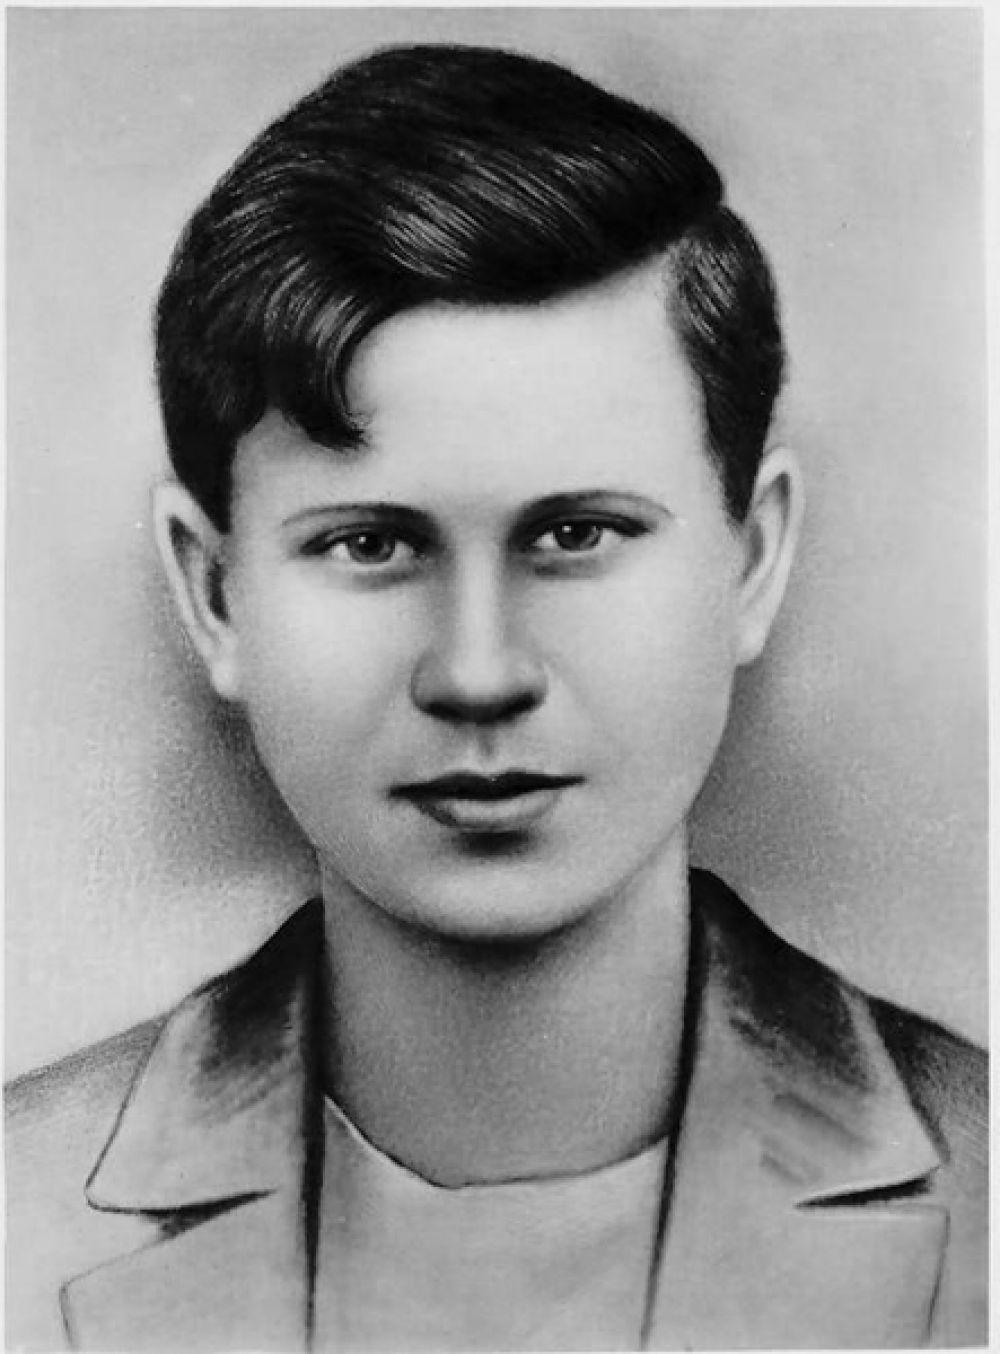 31 yanvarya 1943 goda kaznyon «molodogvardeec» sergej tyulenin